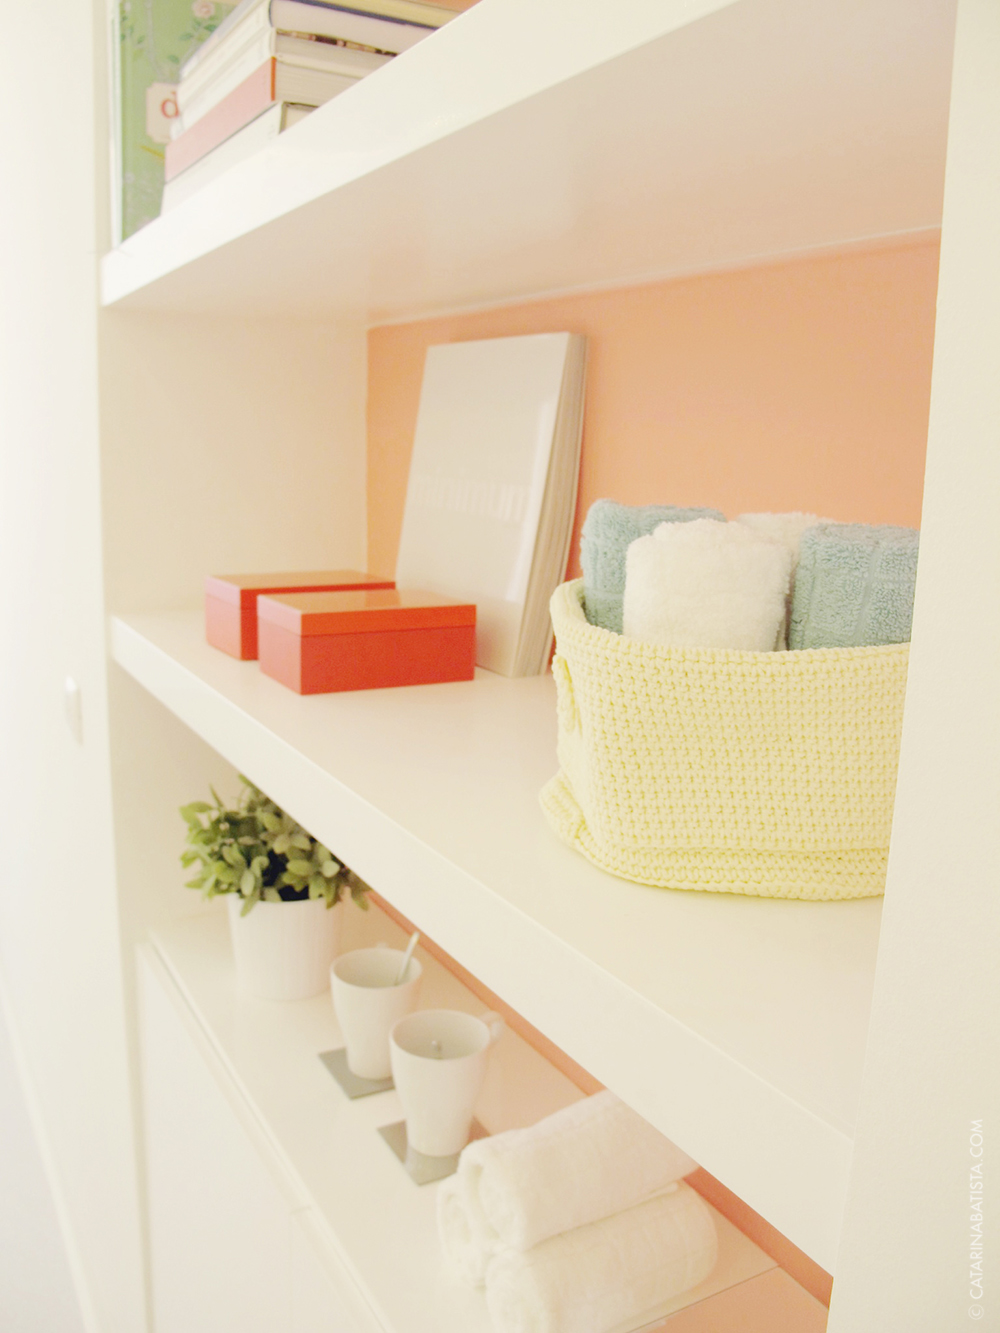 002-catarina-batista-arquitectura-design-interior-decoracao-clinicia.jpg